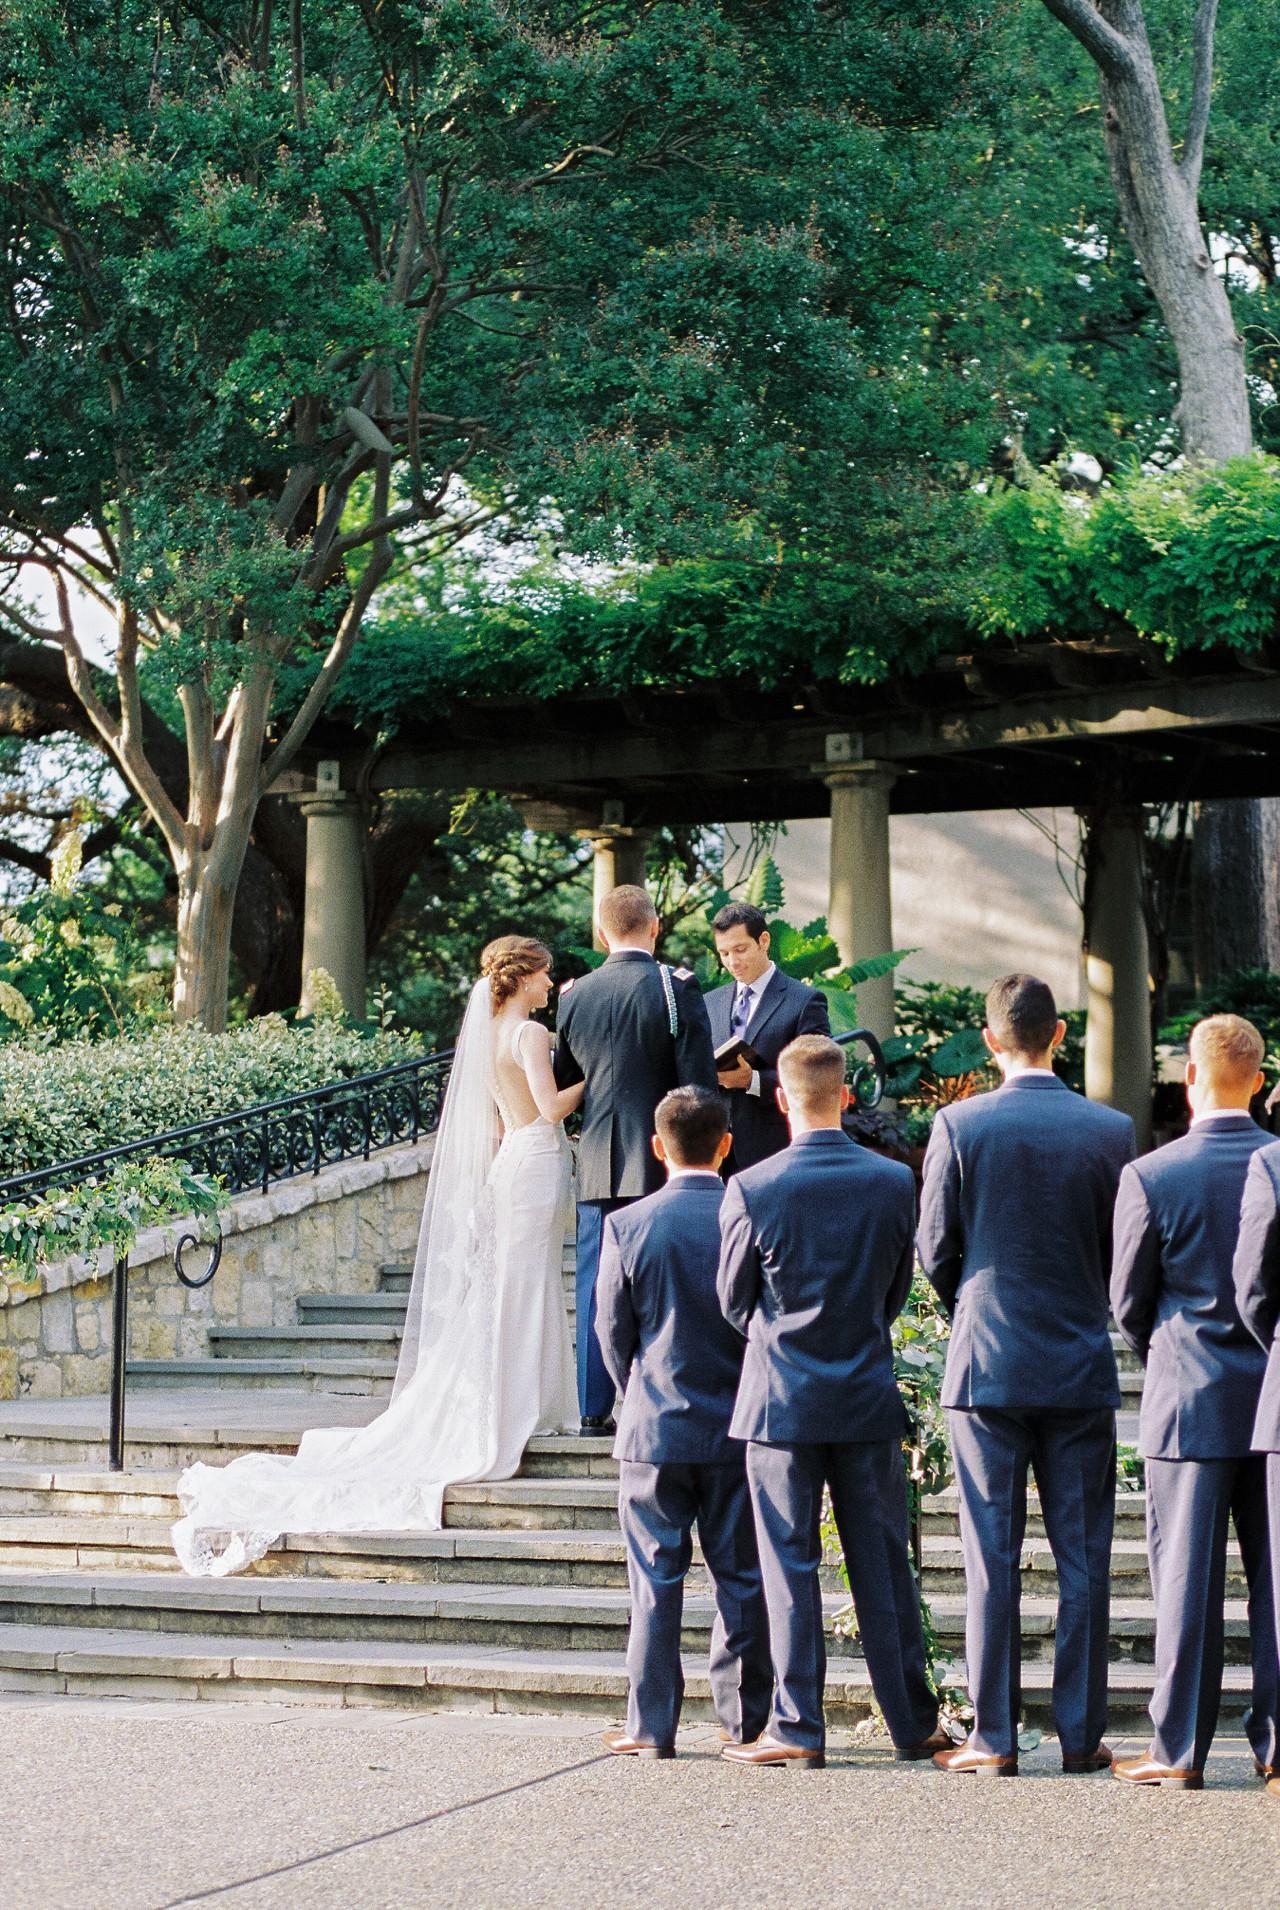 Becca Lea Photography - Dallas, Austin Destination Fine Art Wedding Photographer